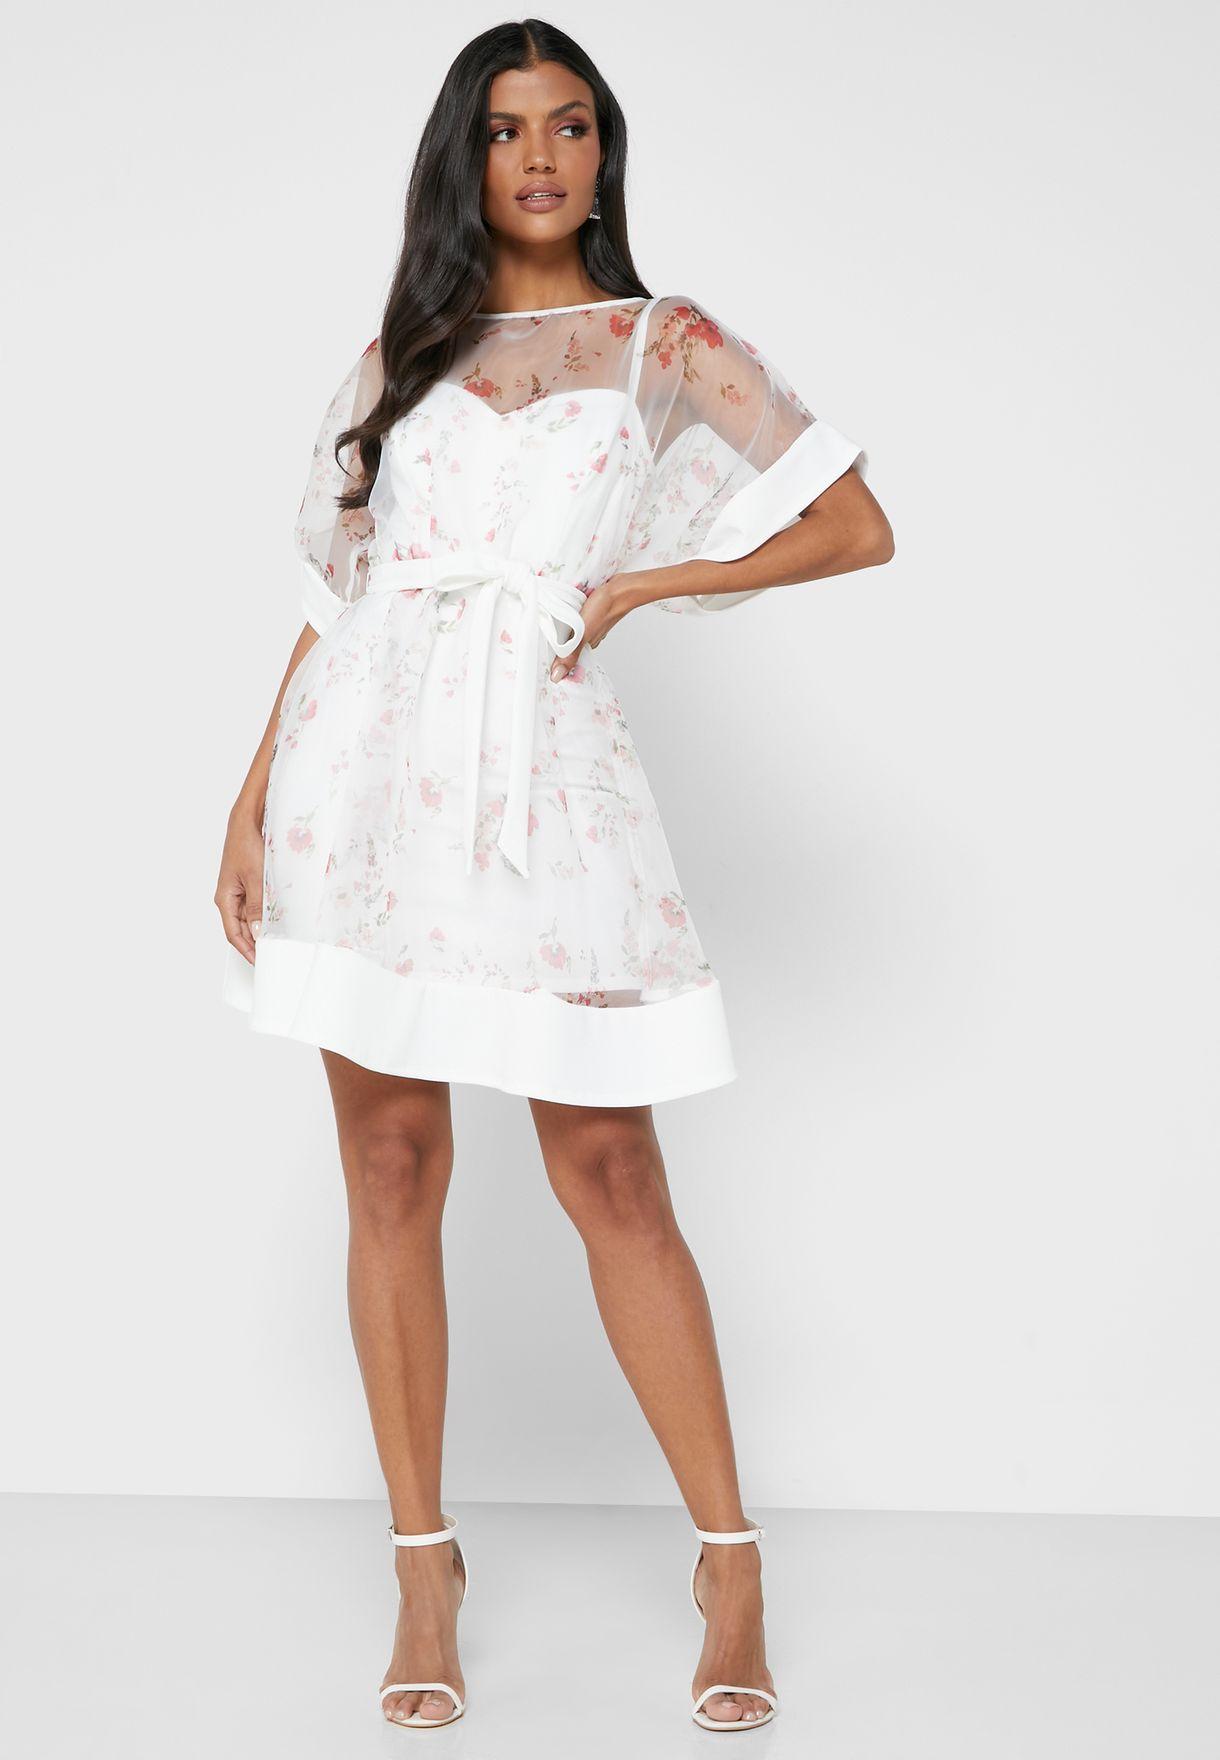 فستان اورجانزا قصير